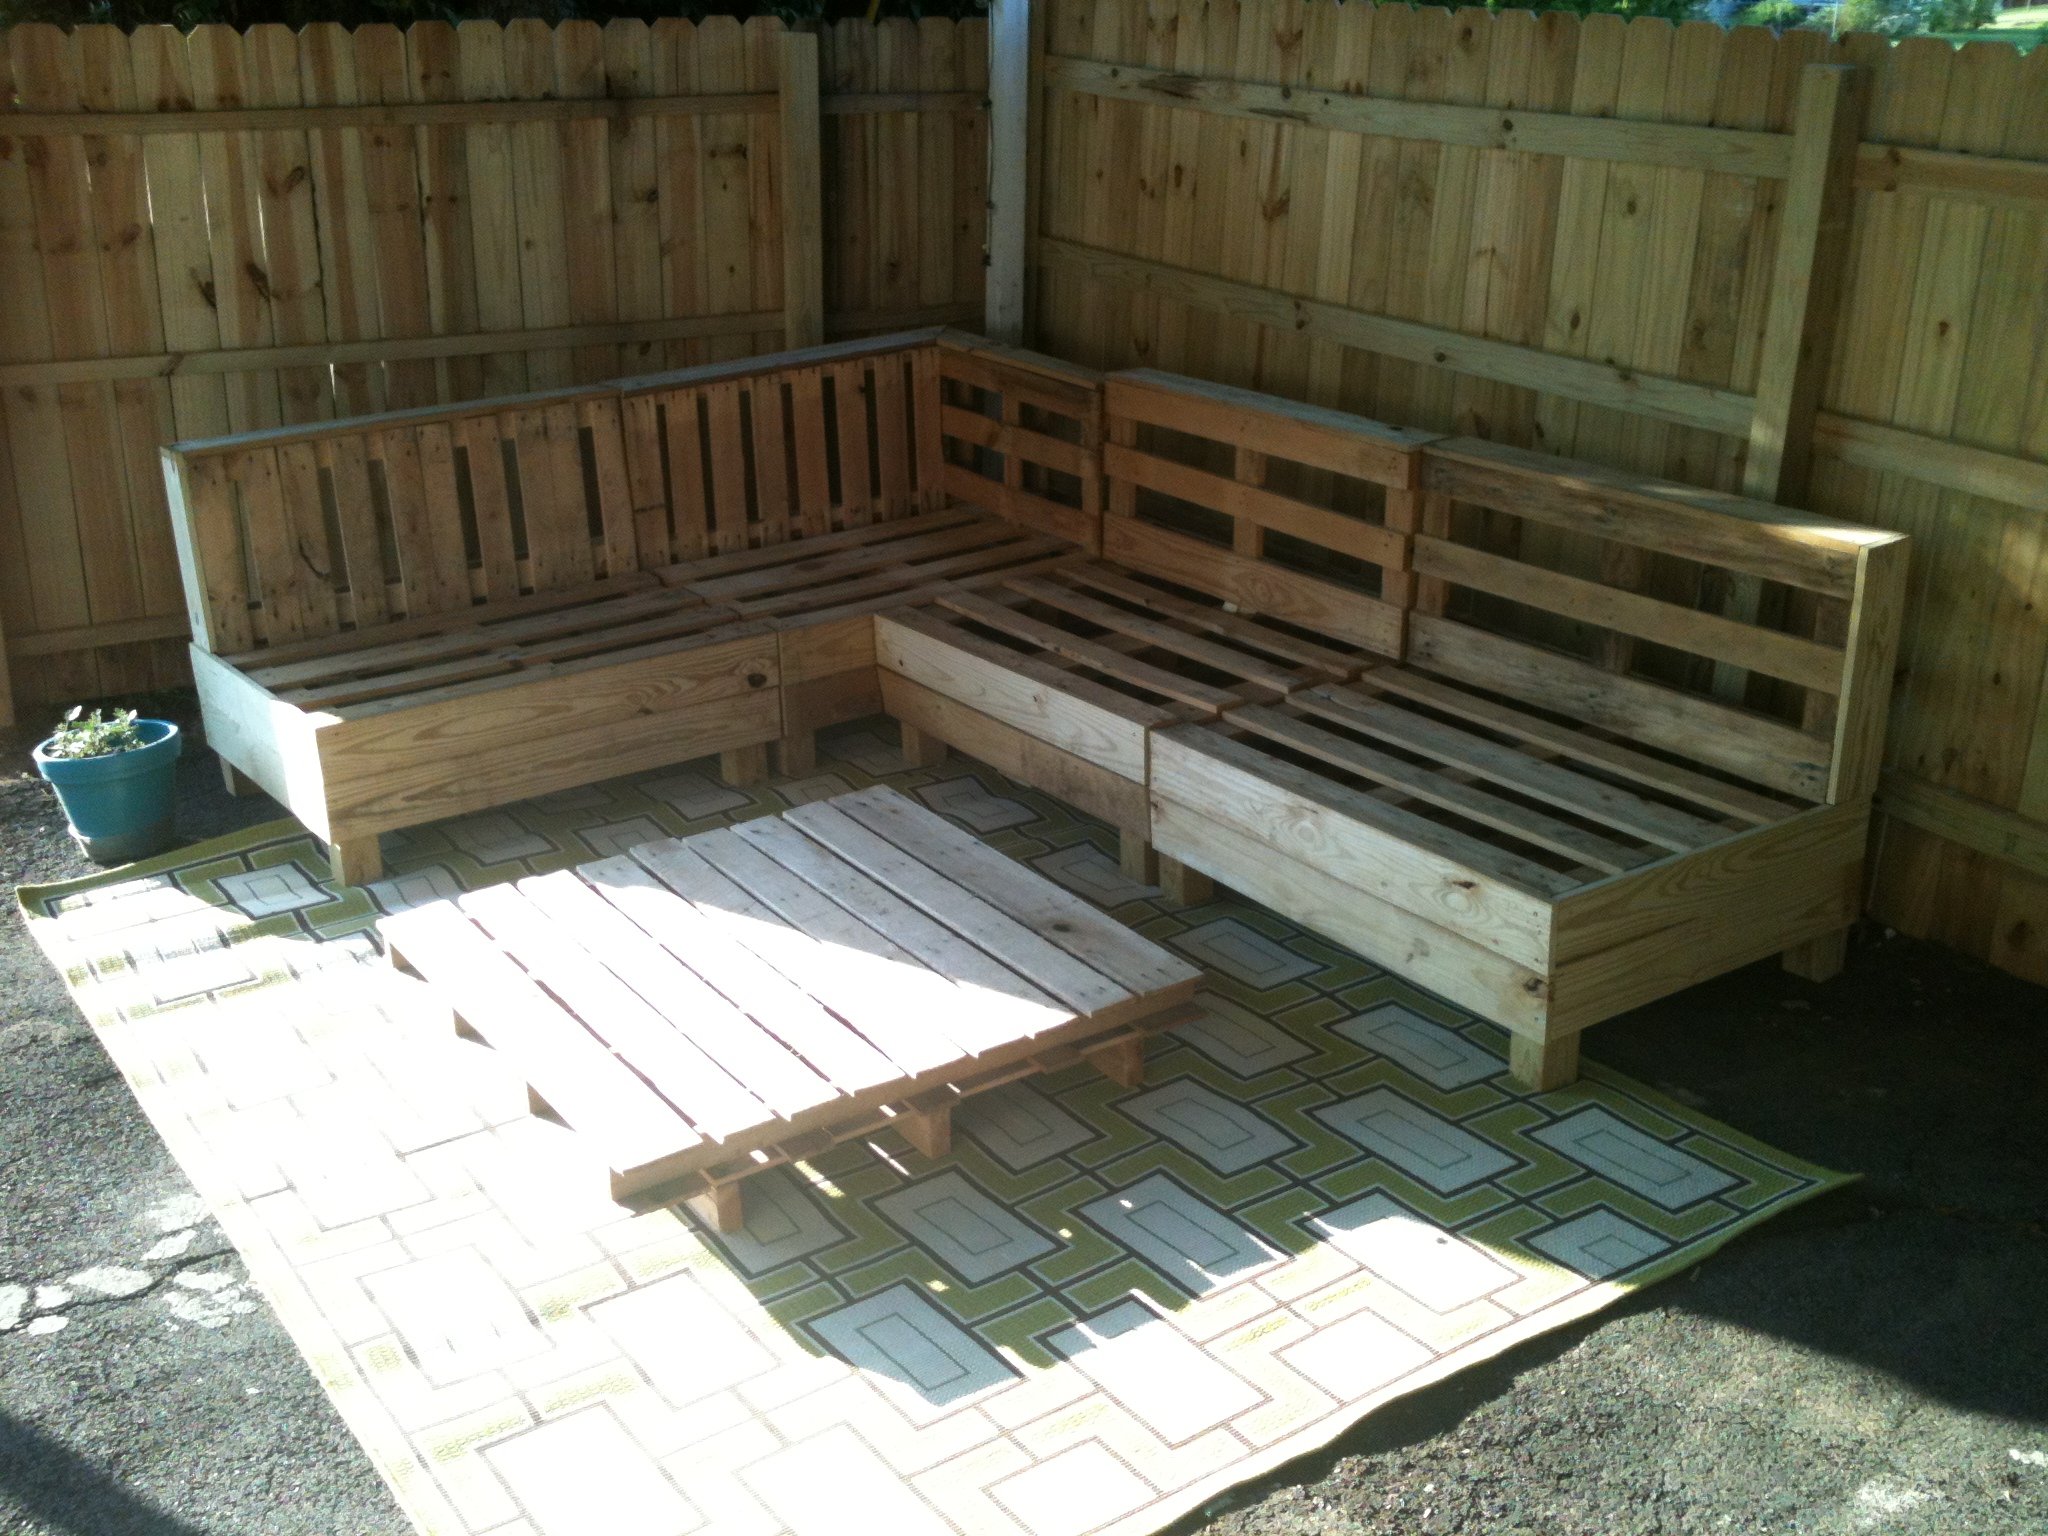 diy sofa from pallets u bed pinterest pallet cedar lane